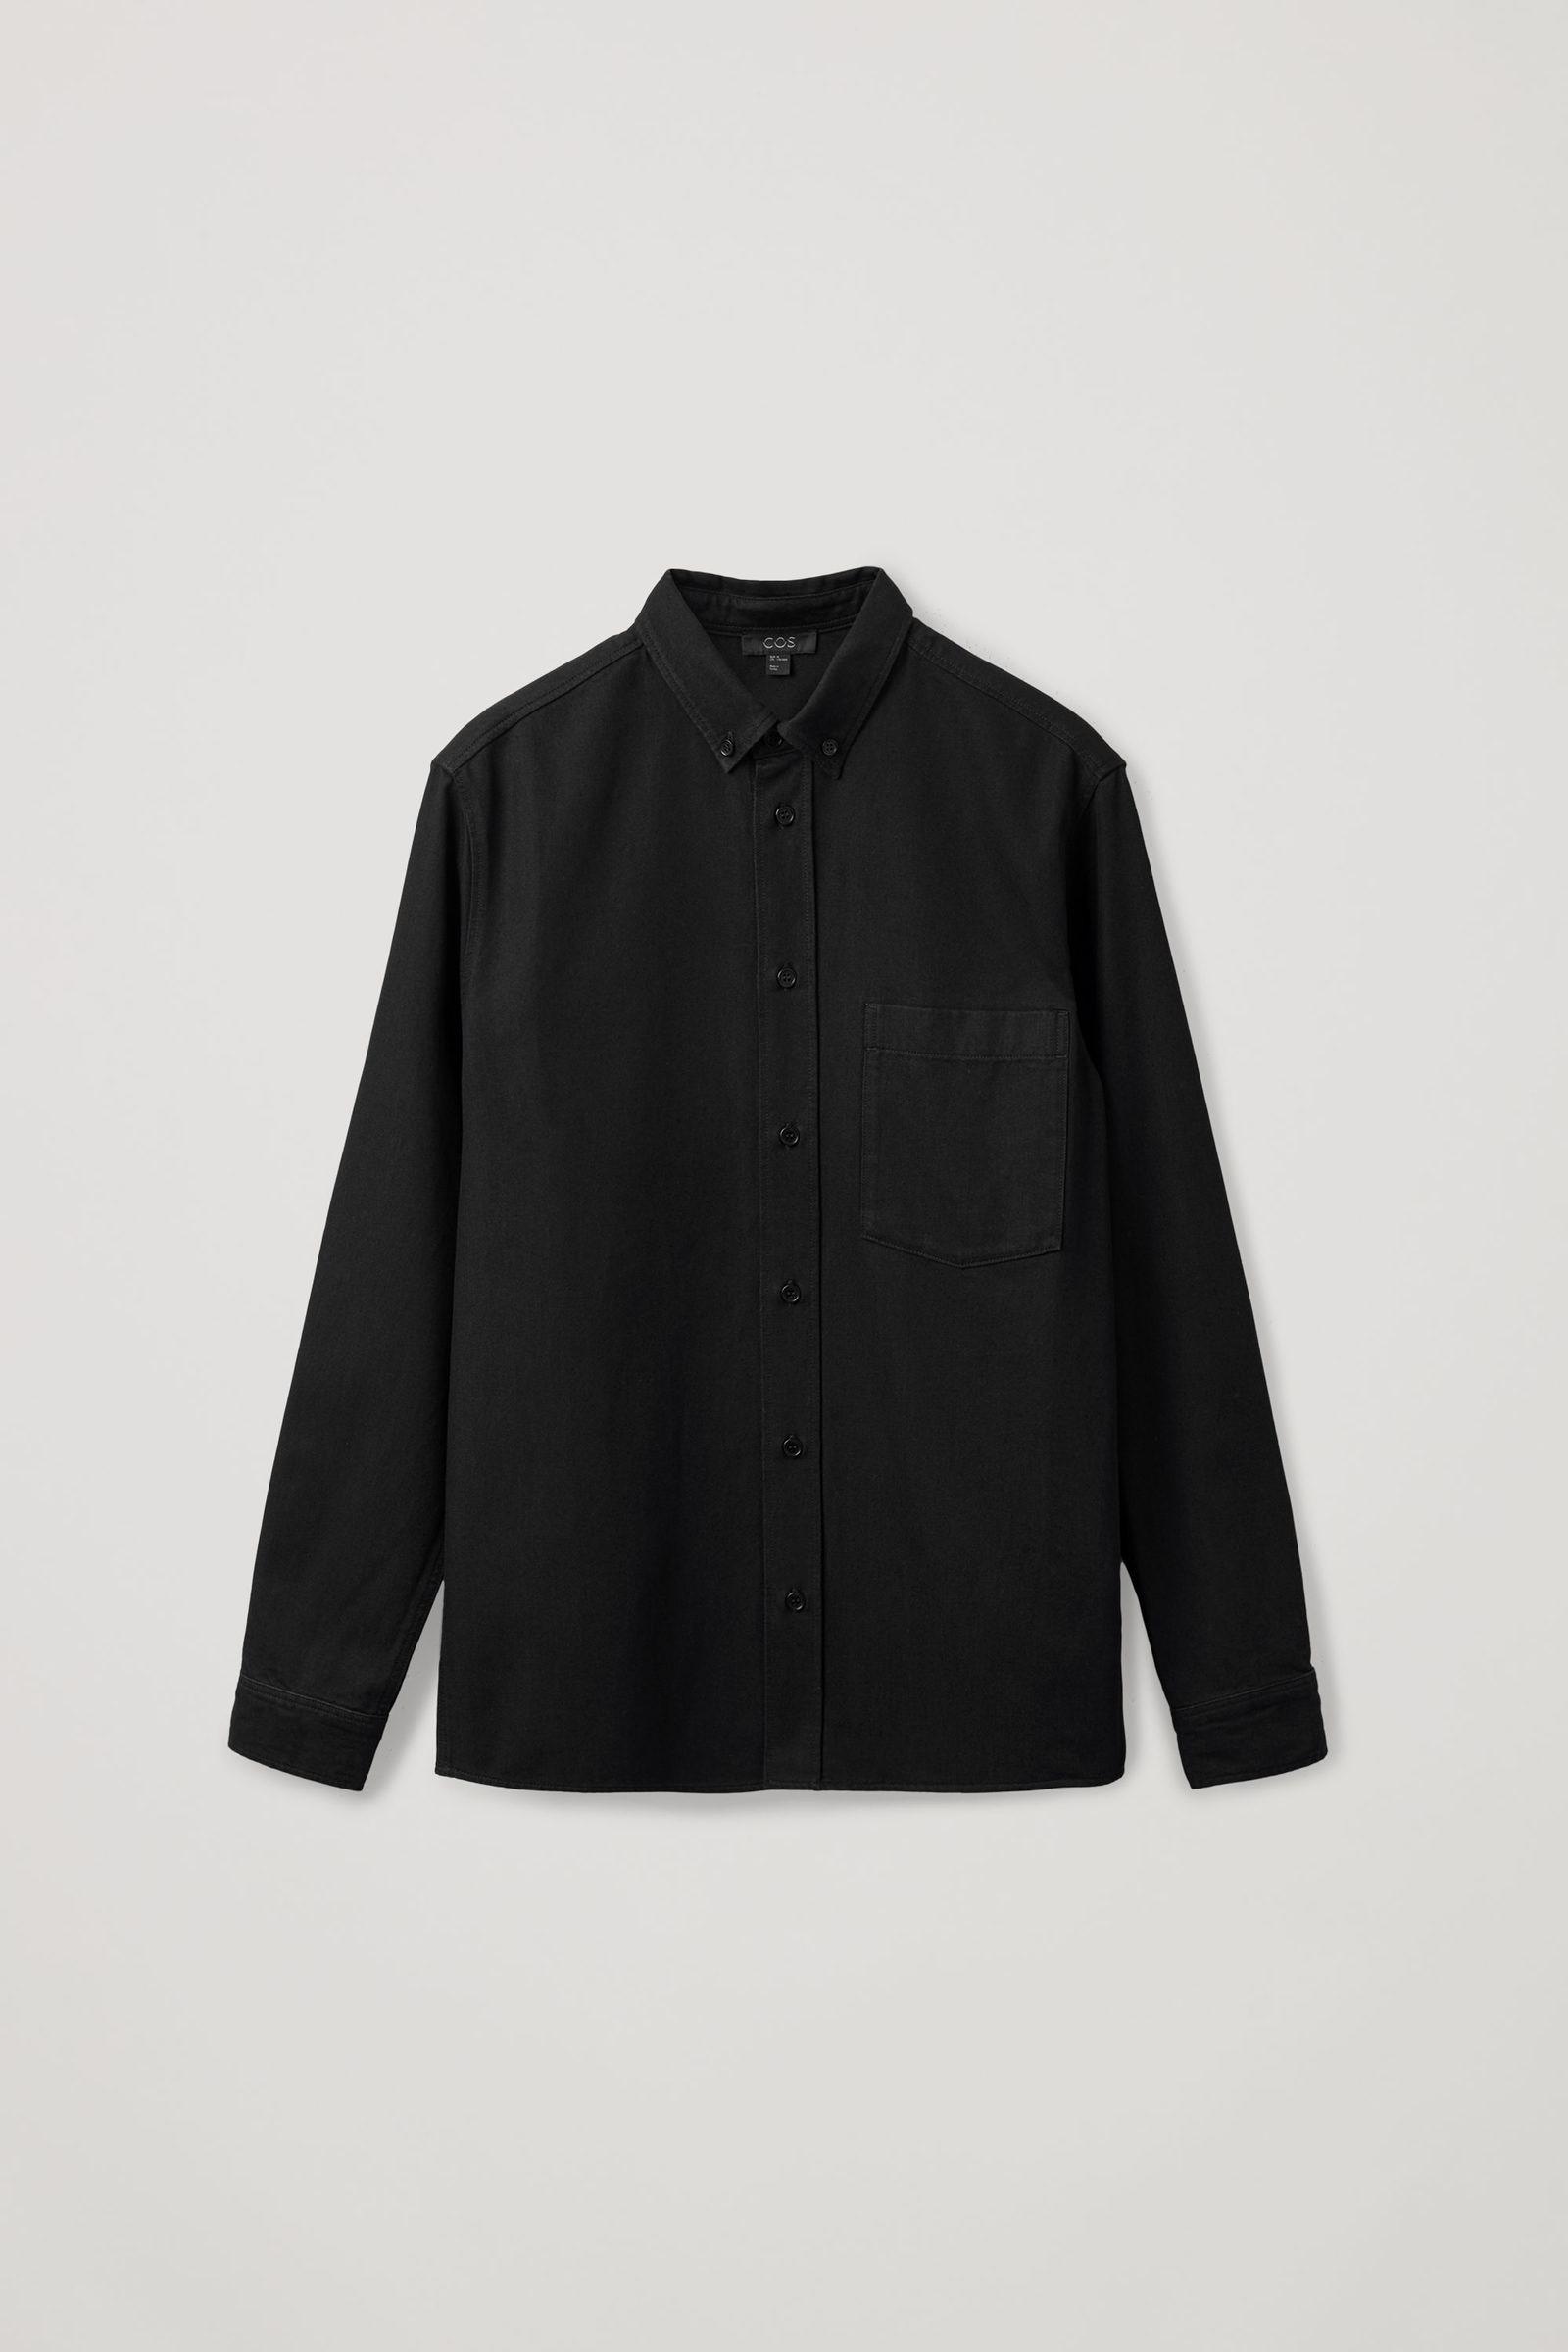 COS 데님 옥스포드 셔츠의 블랙컬러 Product입니다.